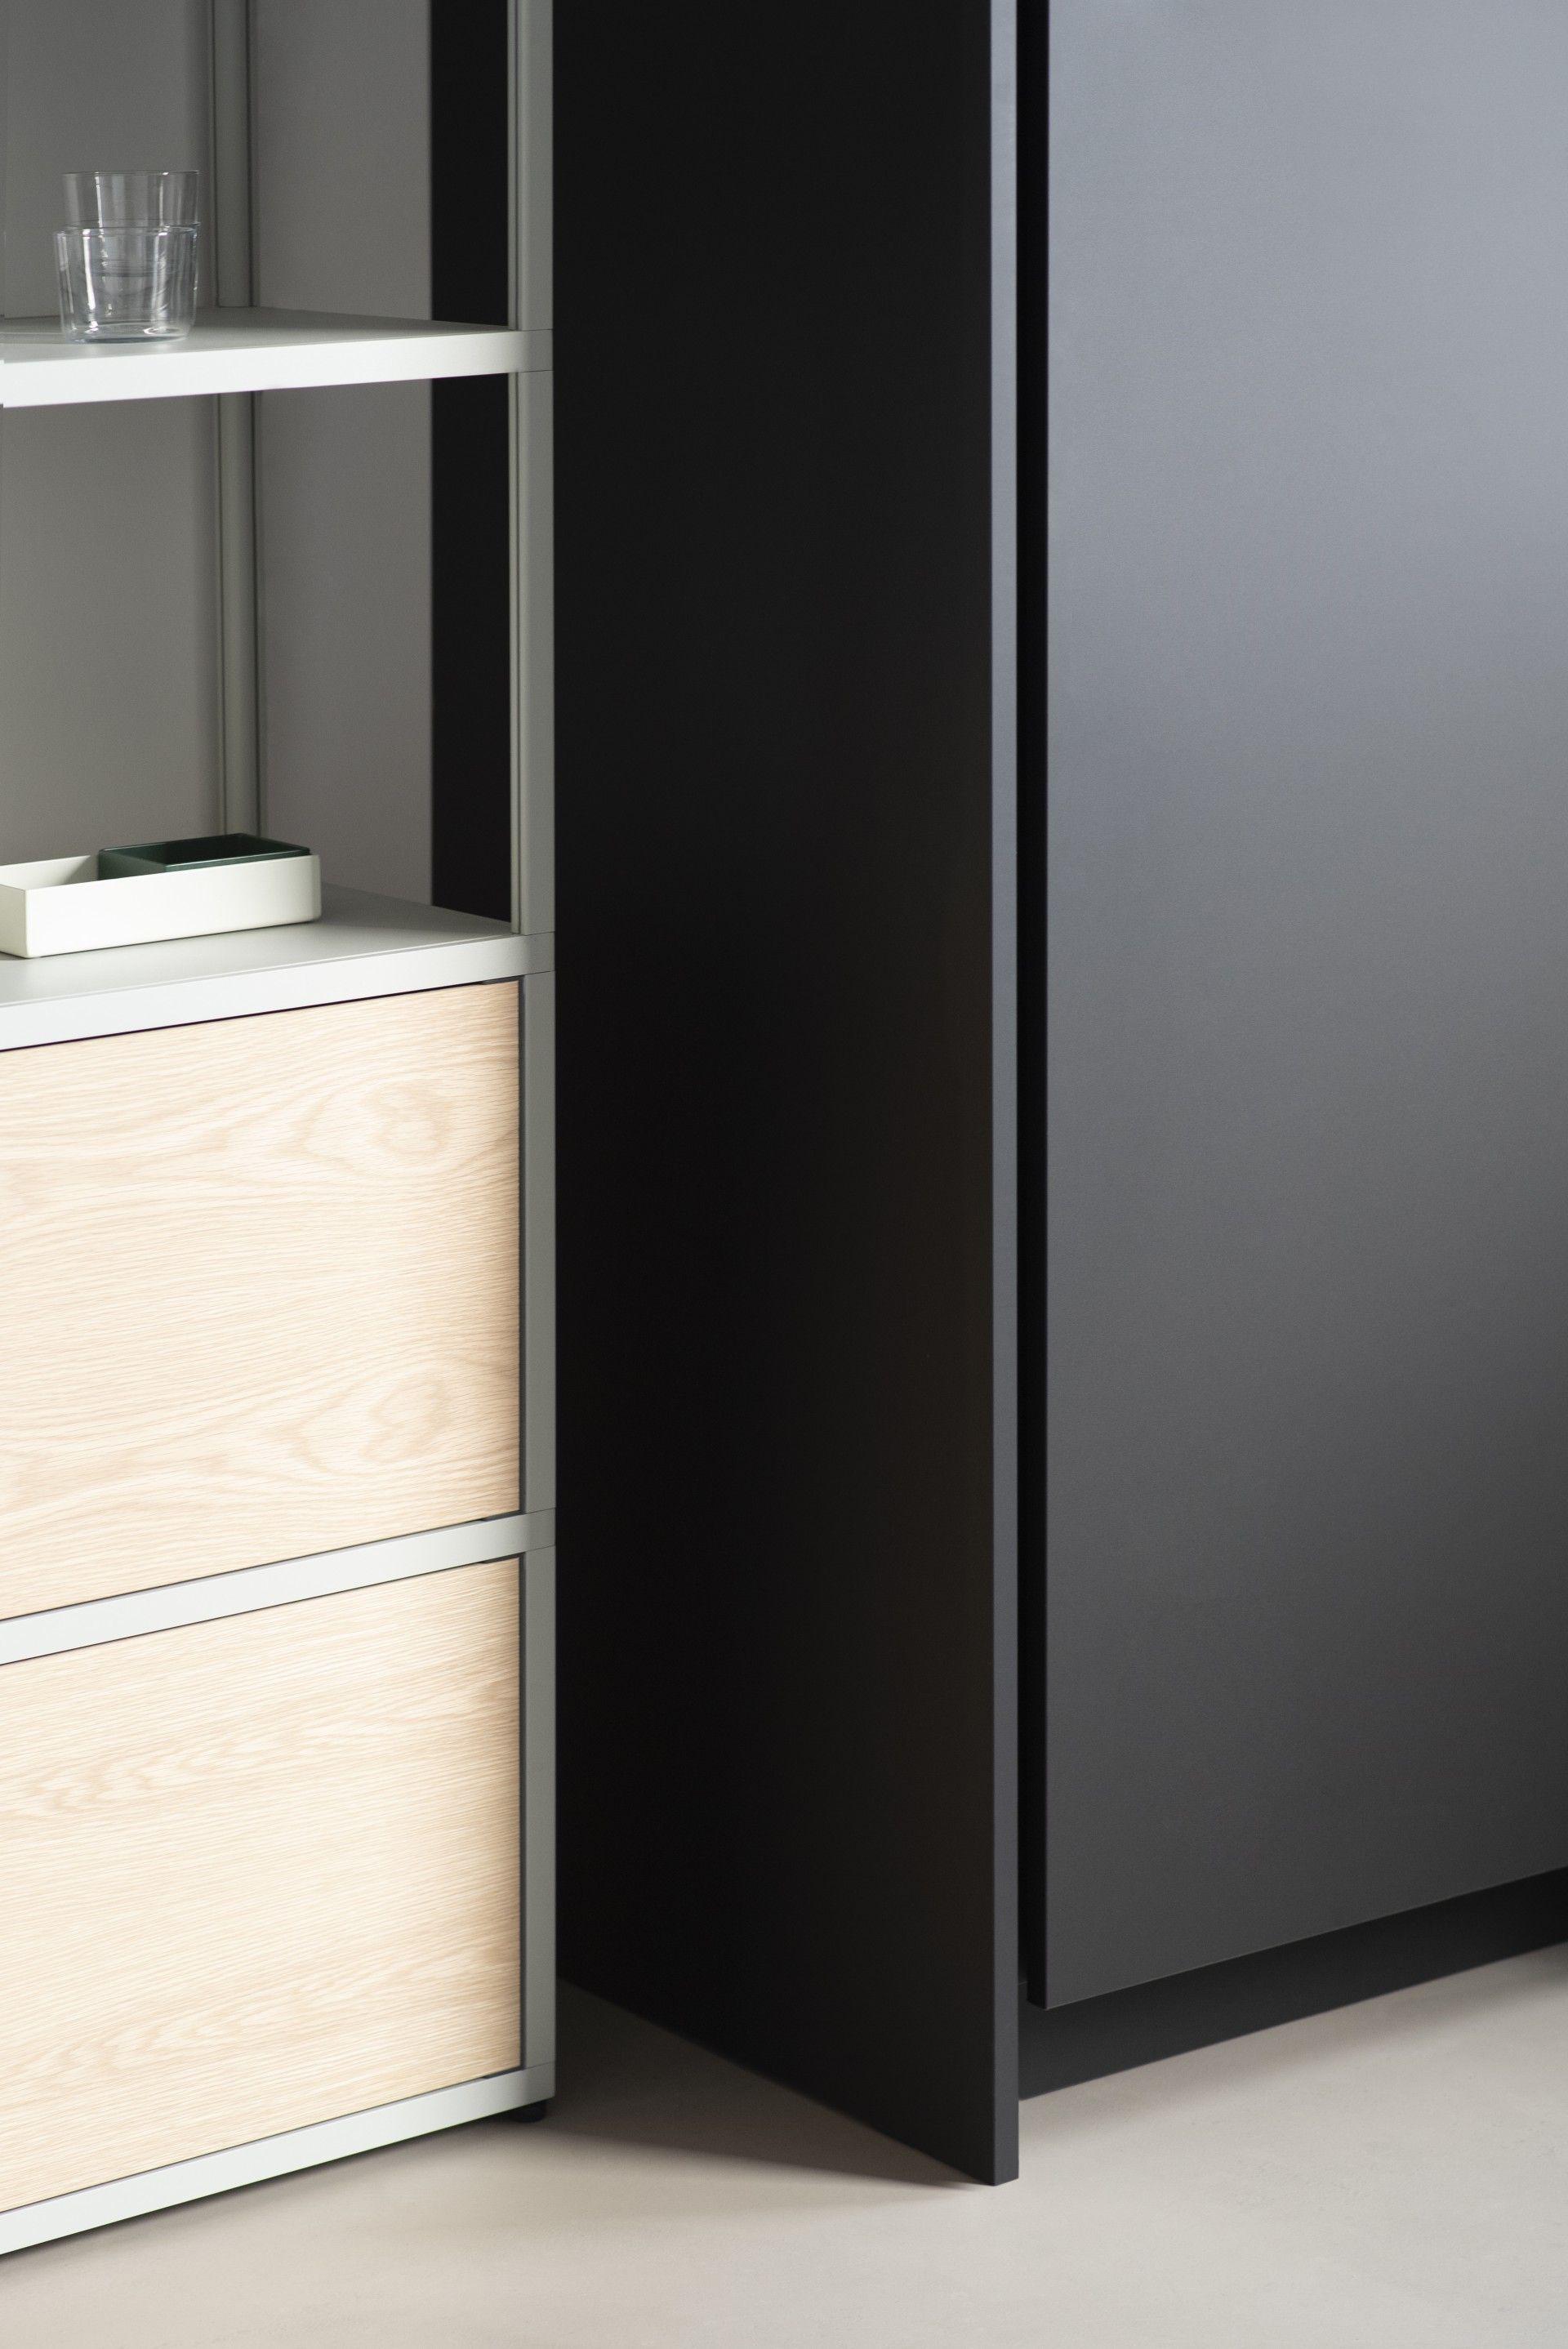 Gerdesmeyer Krohn Office For Design Office Kitchen Cologne In 2020 Tall Cabinet Storage Office Design Design